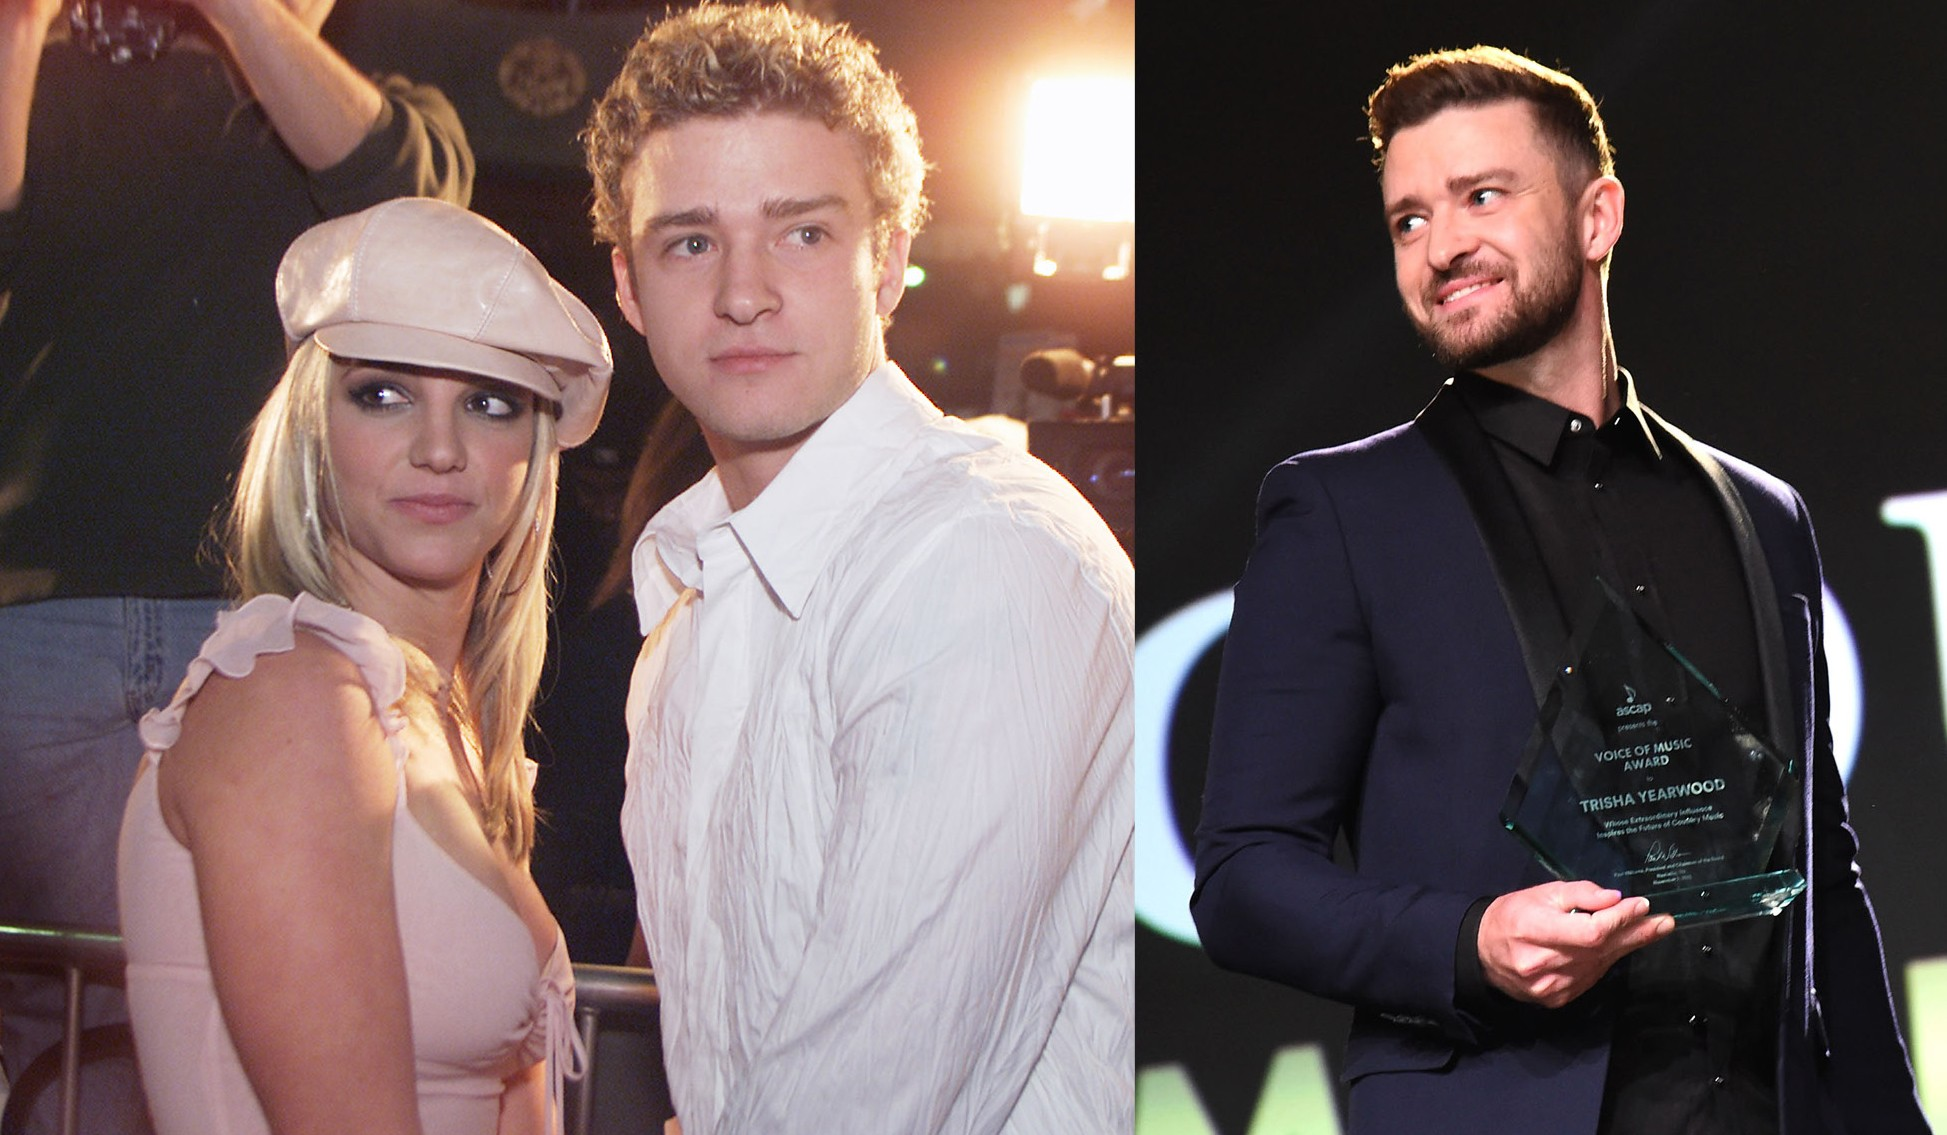 Justin Timberlake e Britney Spears em 2002. E Justin Timberlake em 2015 (Foto: Getty Images)